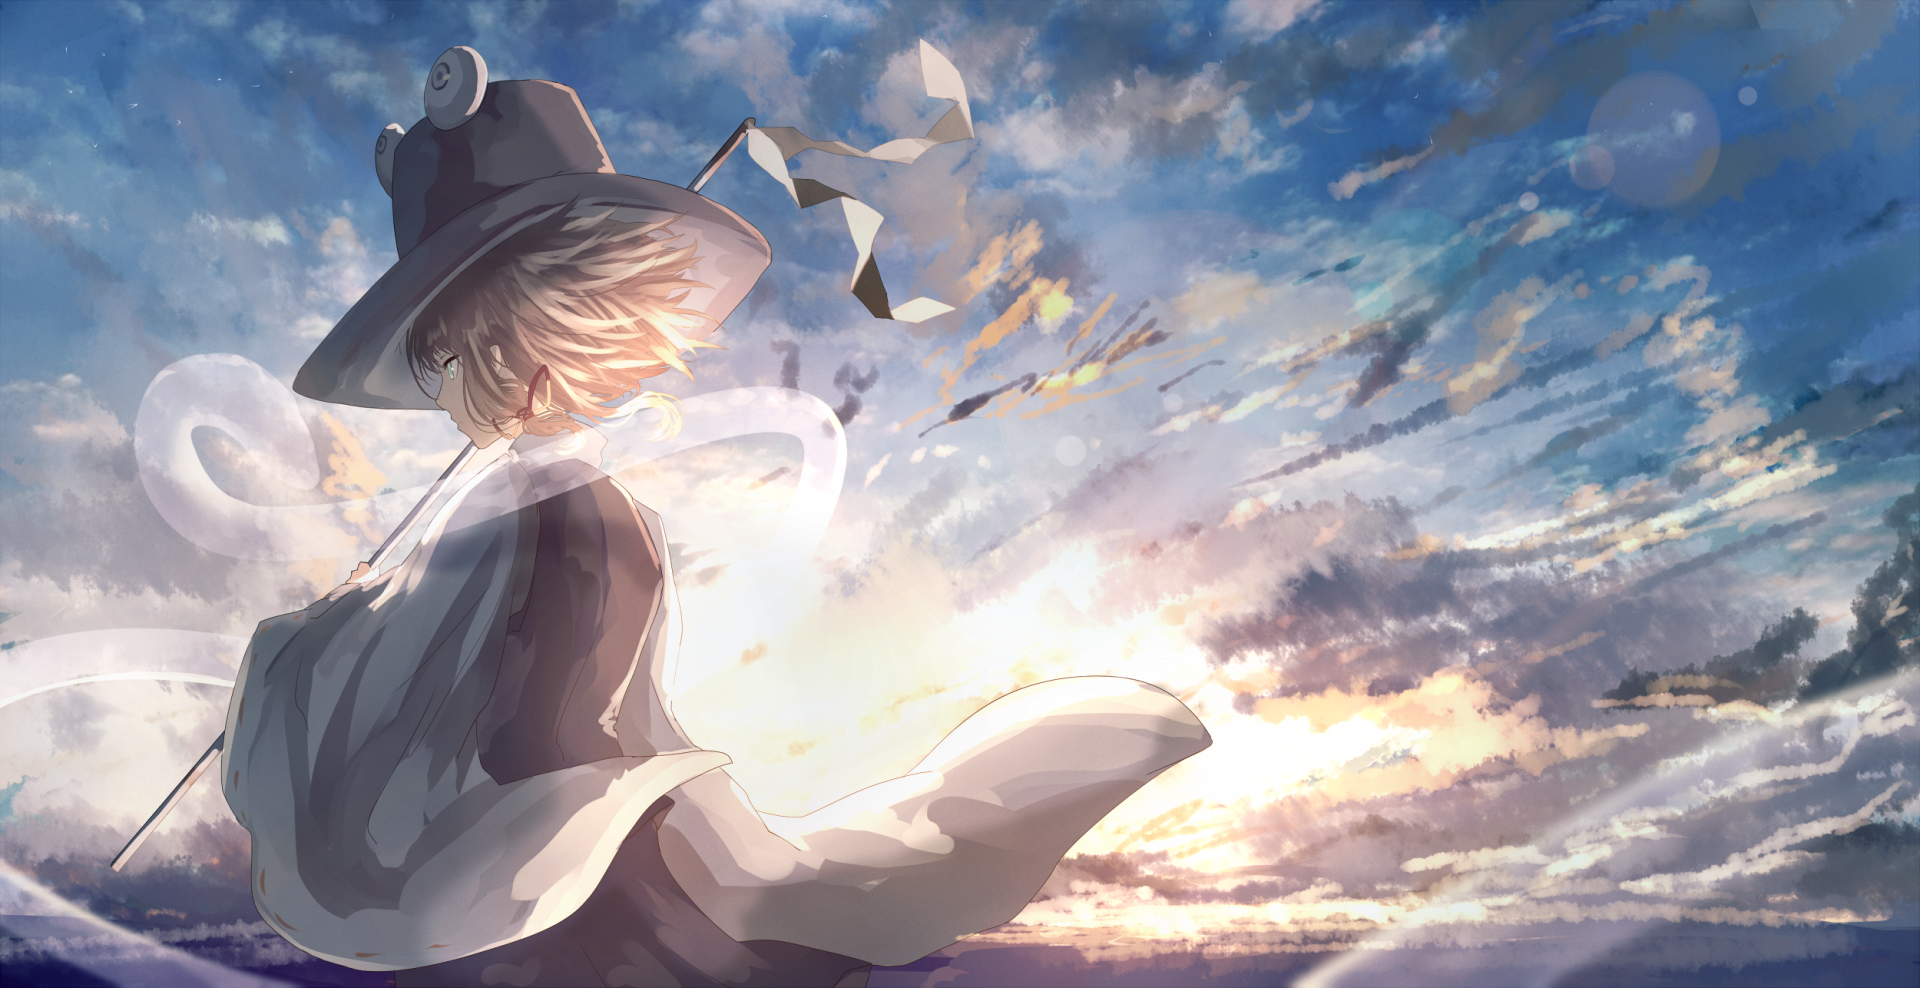 Anime - Touhou  Suwako Moriya Wallpaper